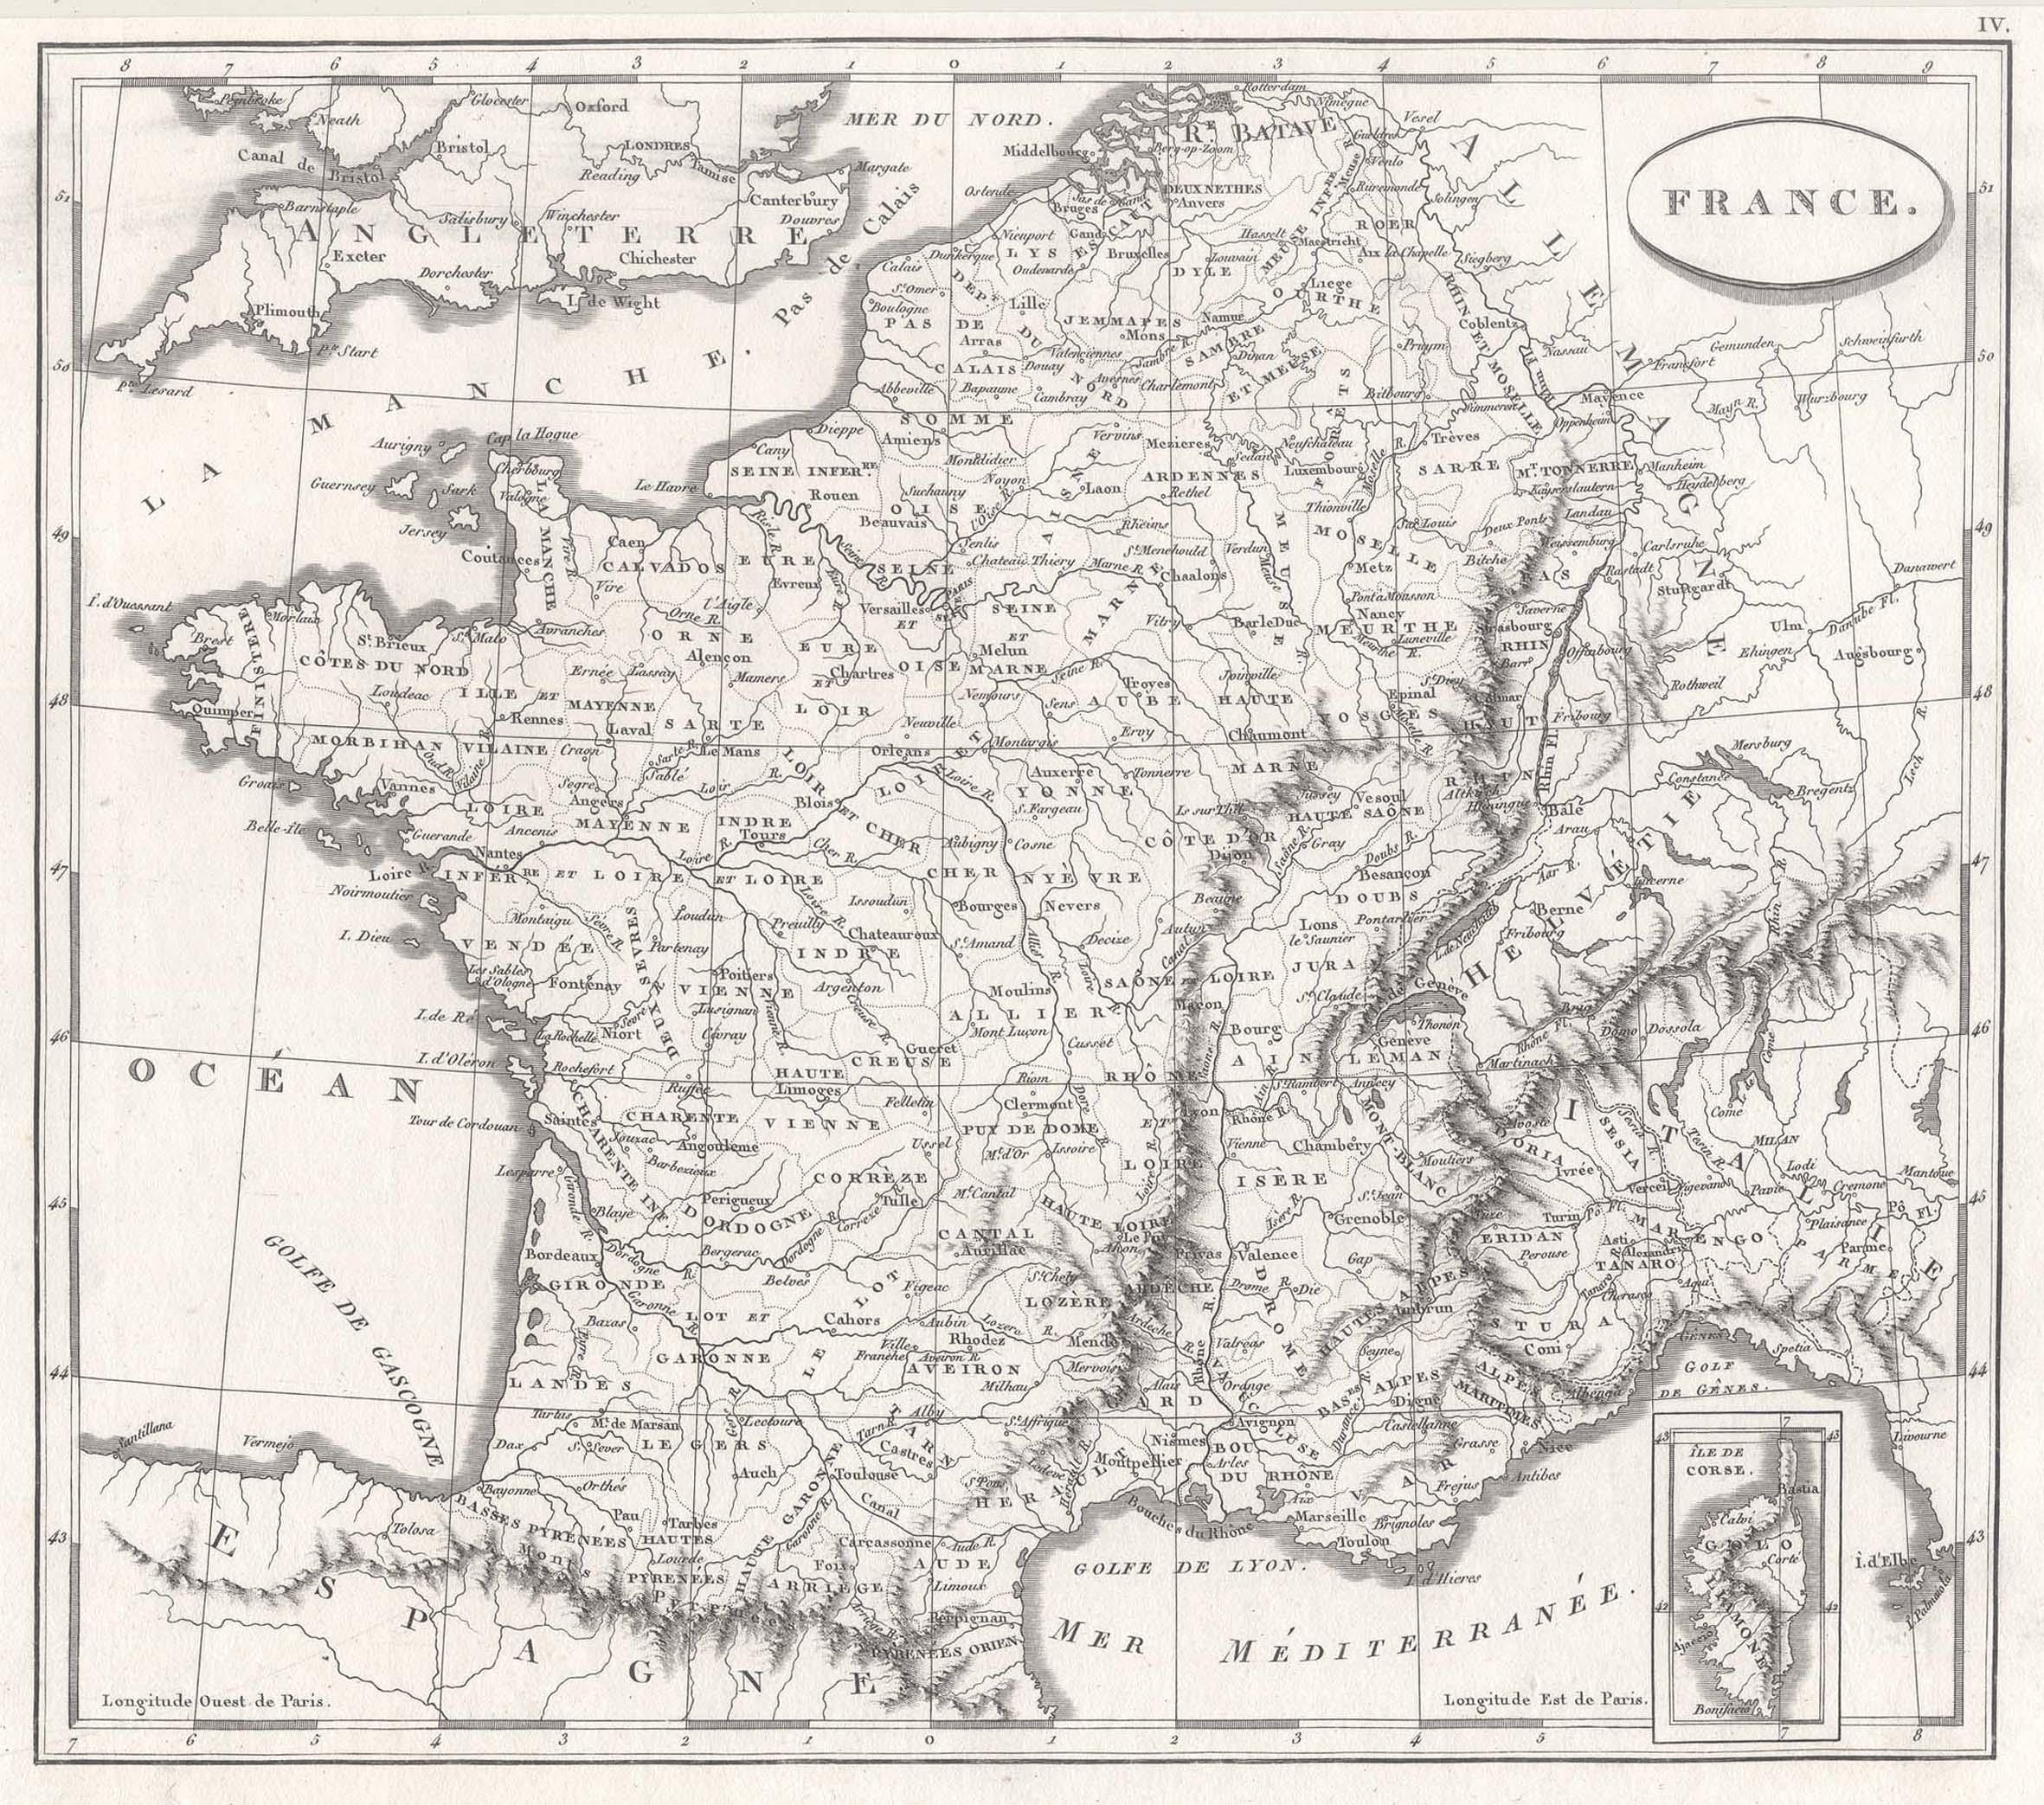 Kst.- Karte, n. Arrowsmith u. Buache aus: Frankreich ( France